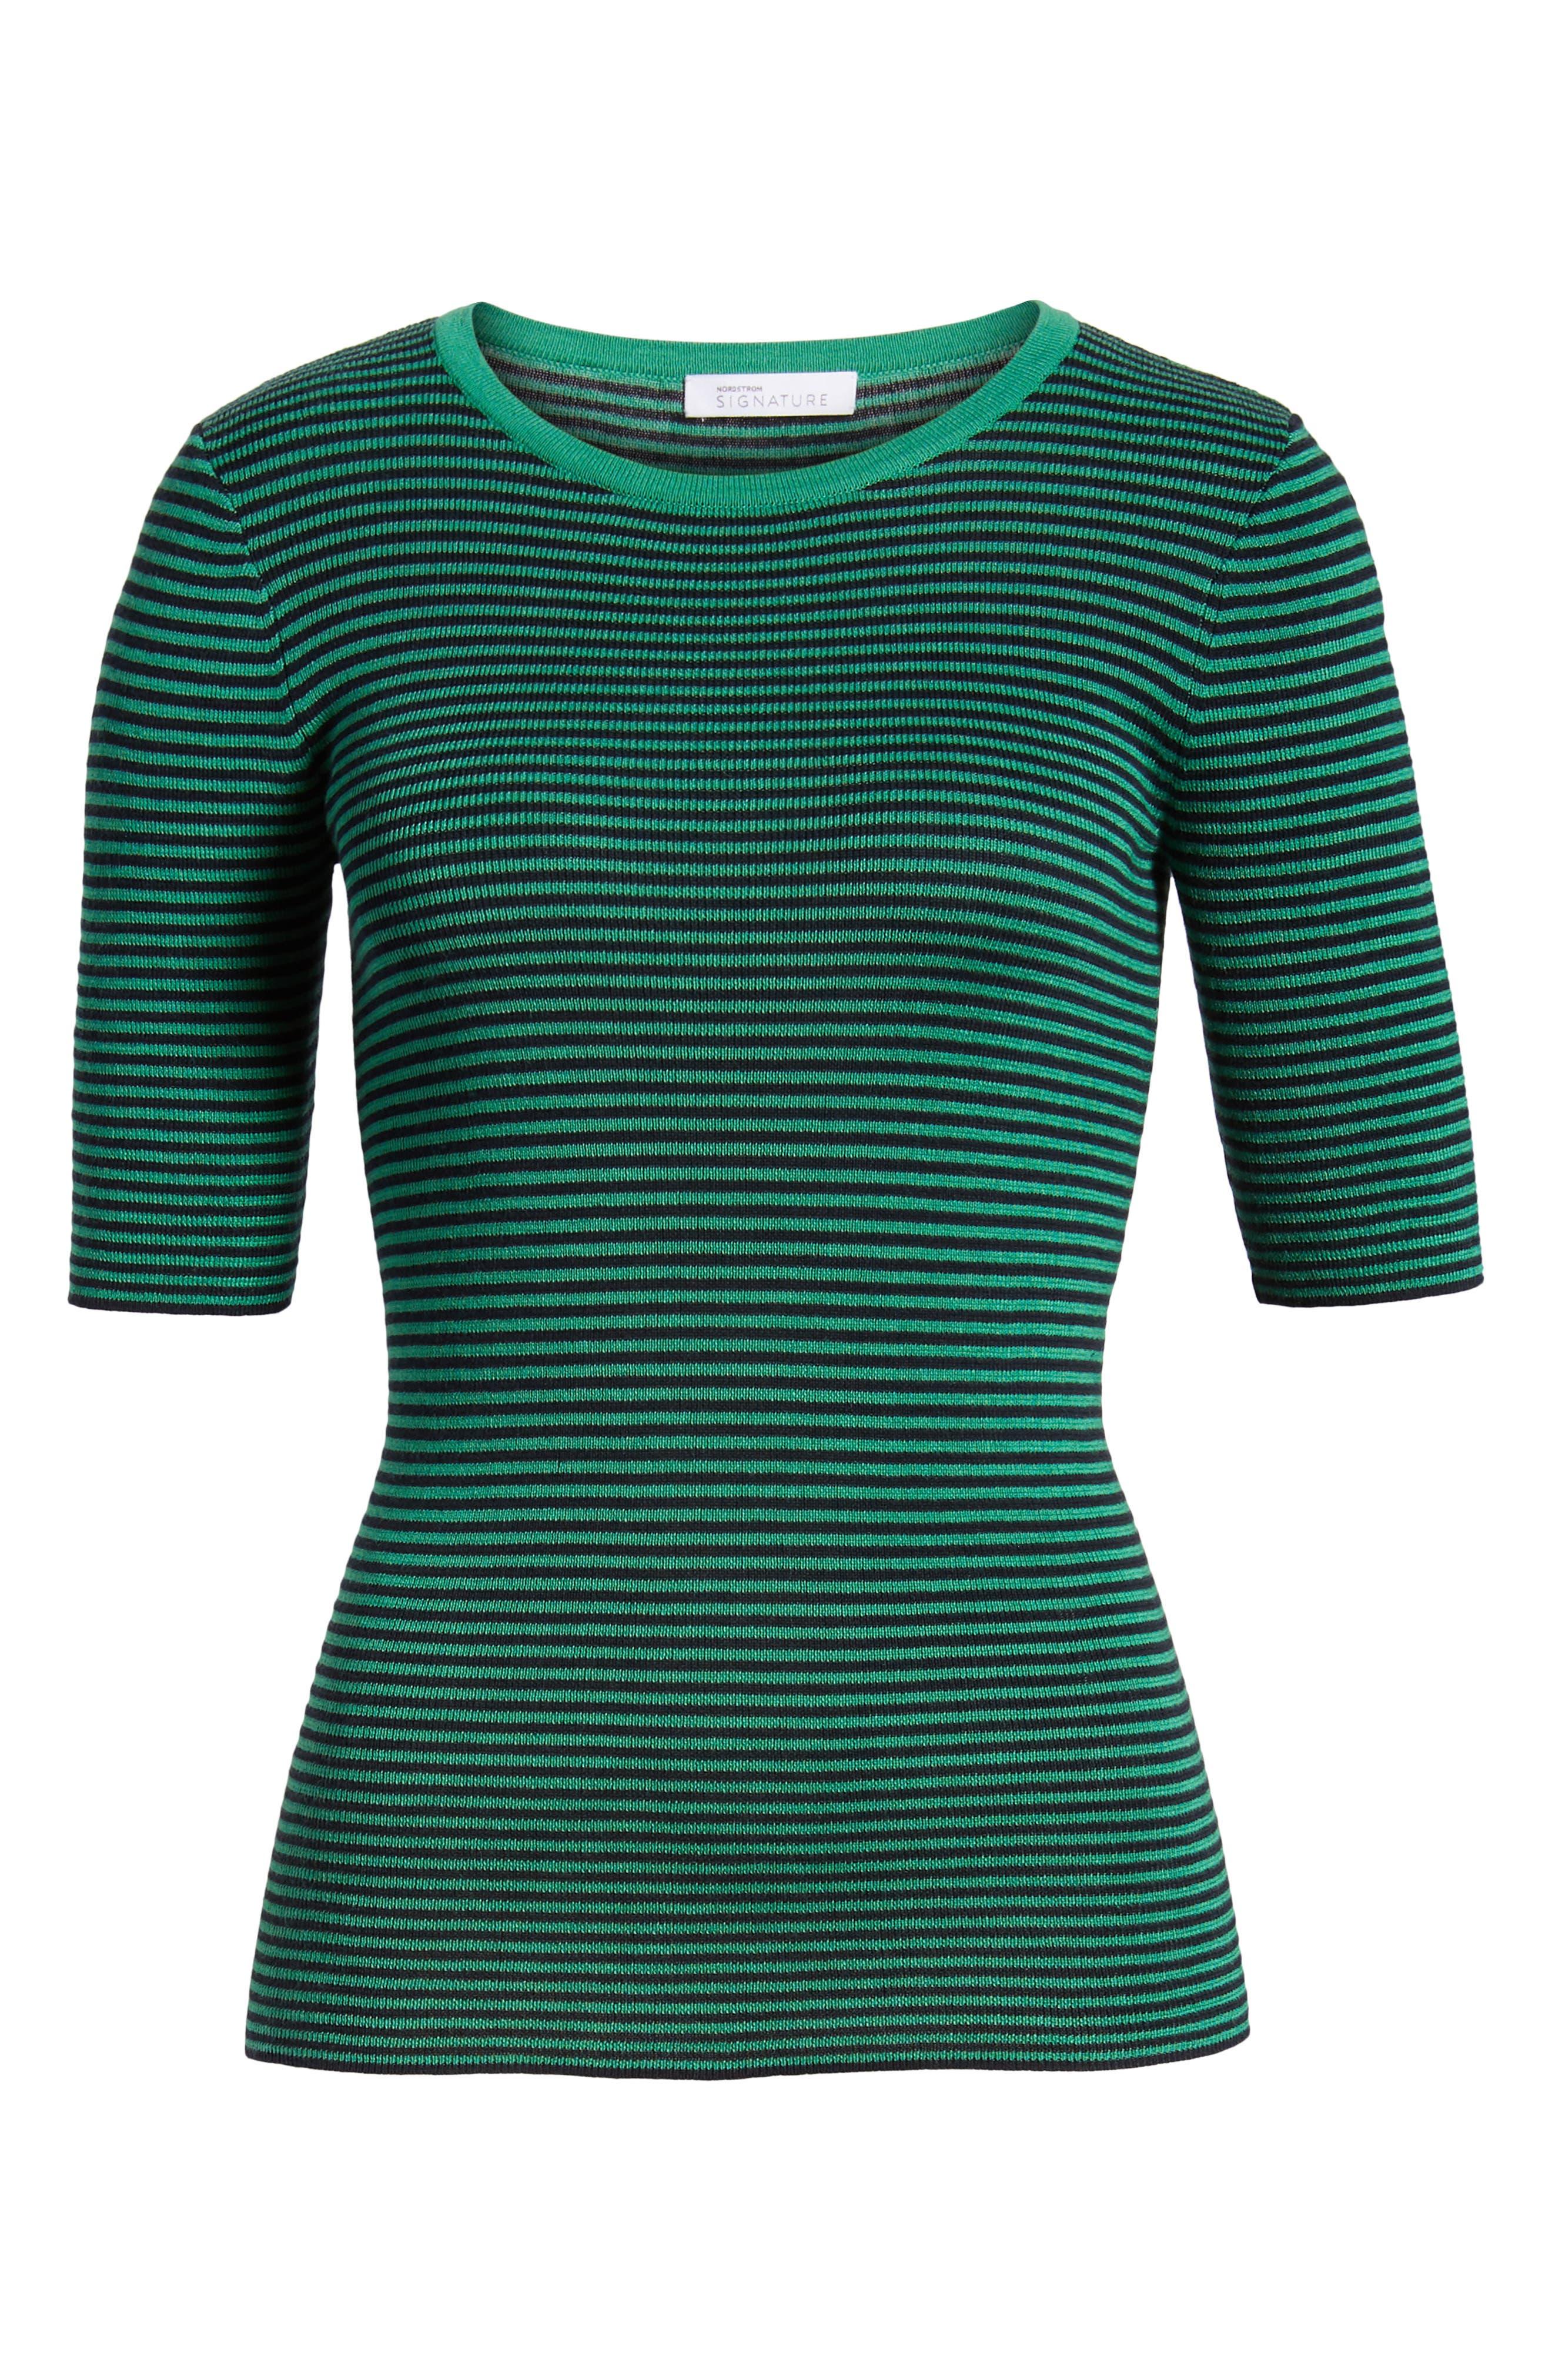 Stripe Crewneck Sweater,                             Alternate thumbnail 7, color,                             315